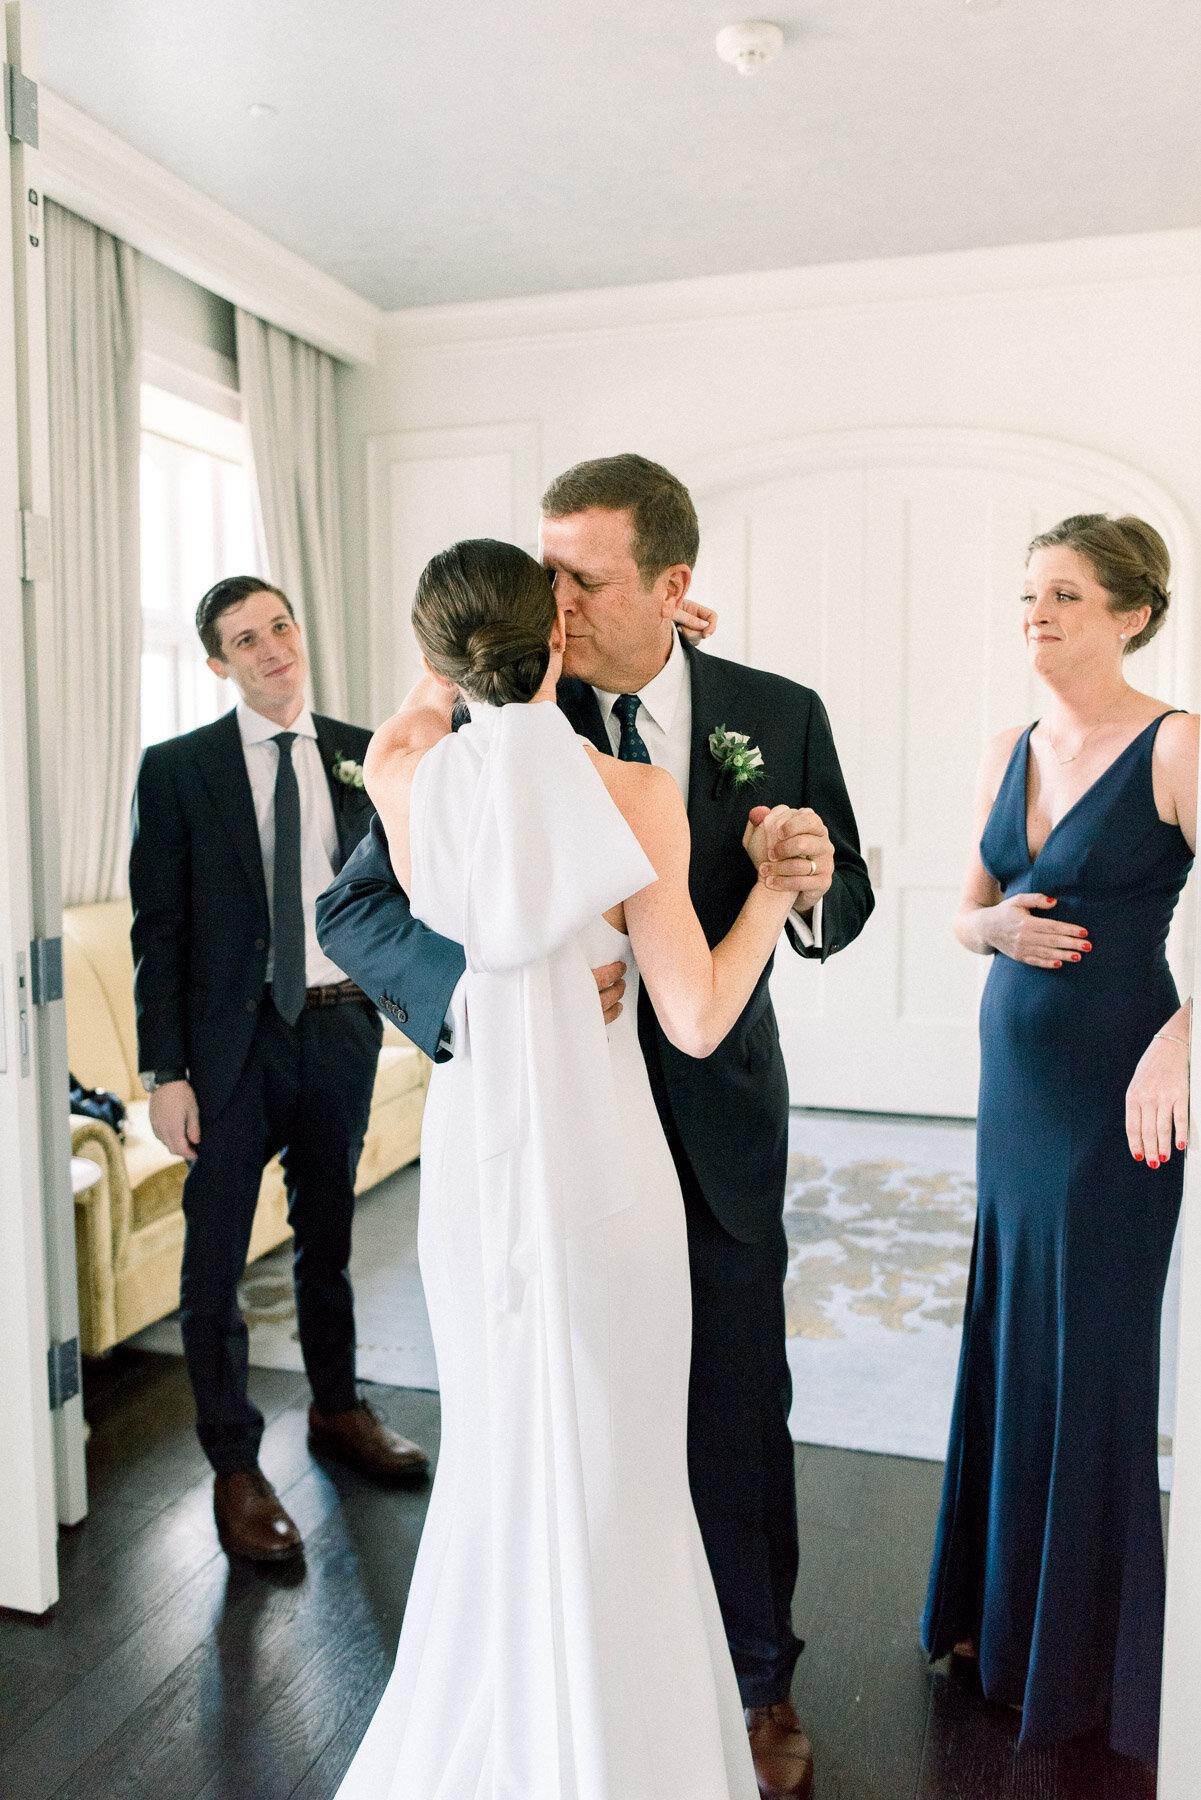 Adelphi Saratoga Wedding by Michelle Lange Photography-15.jpg